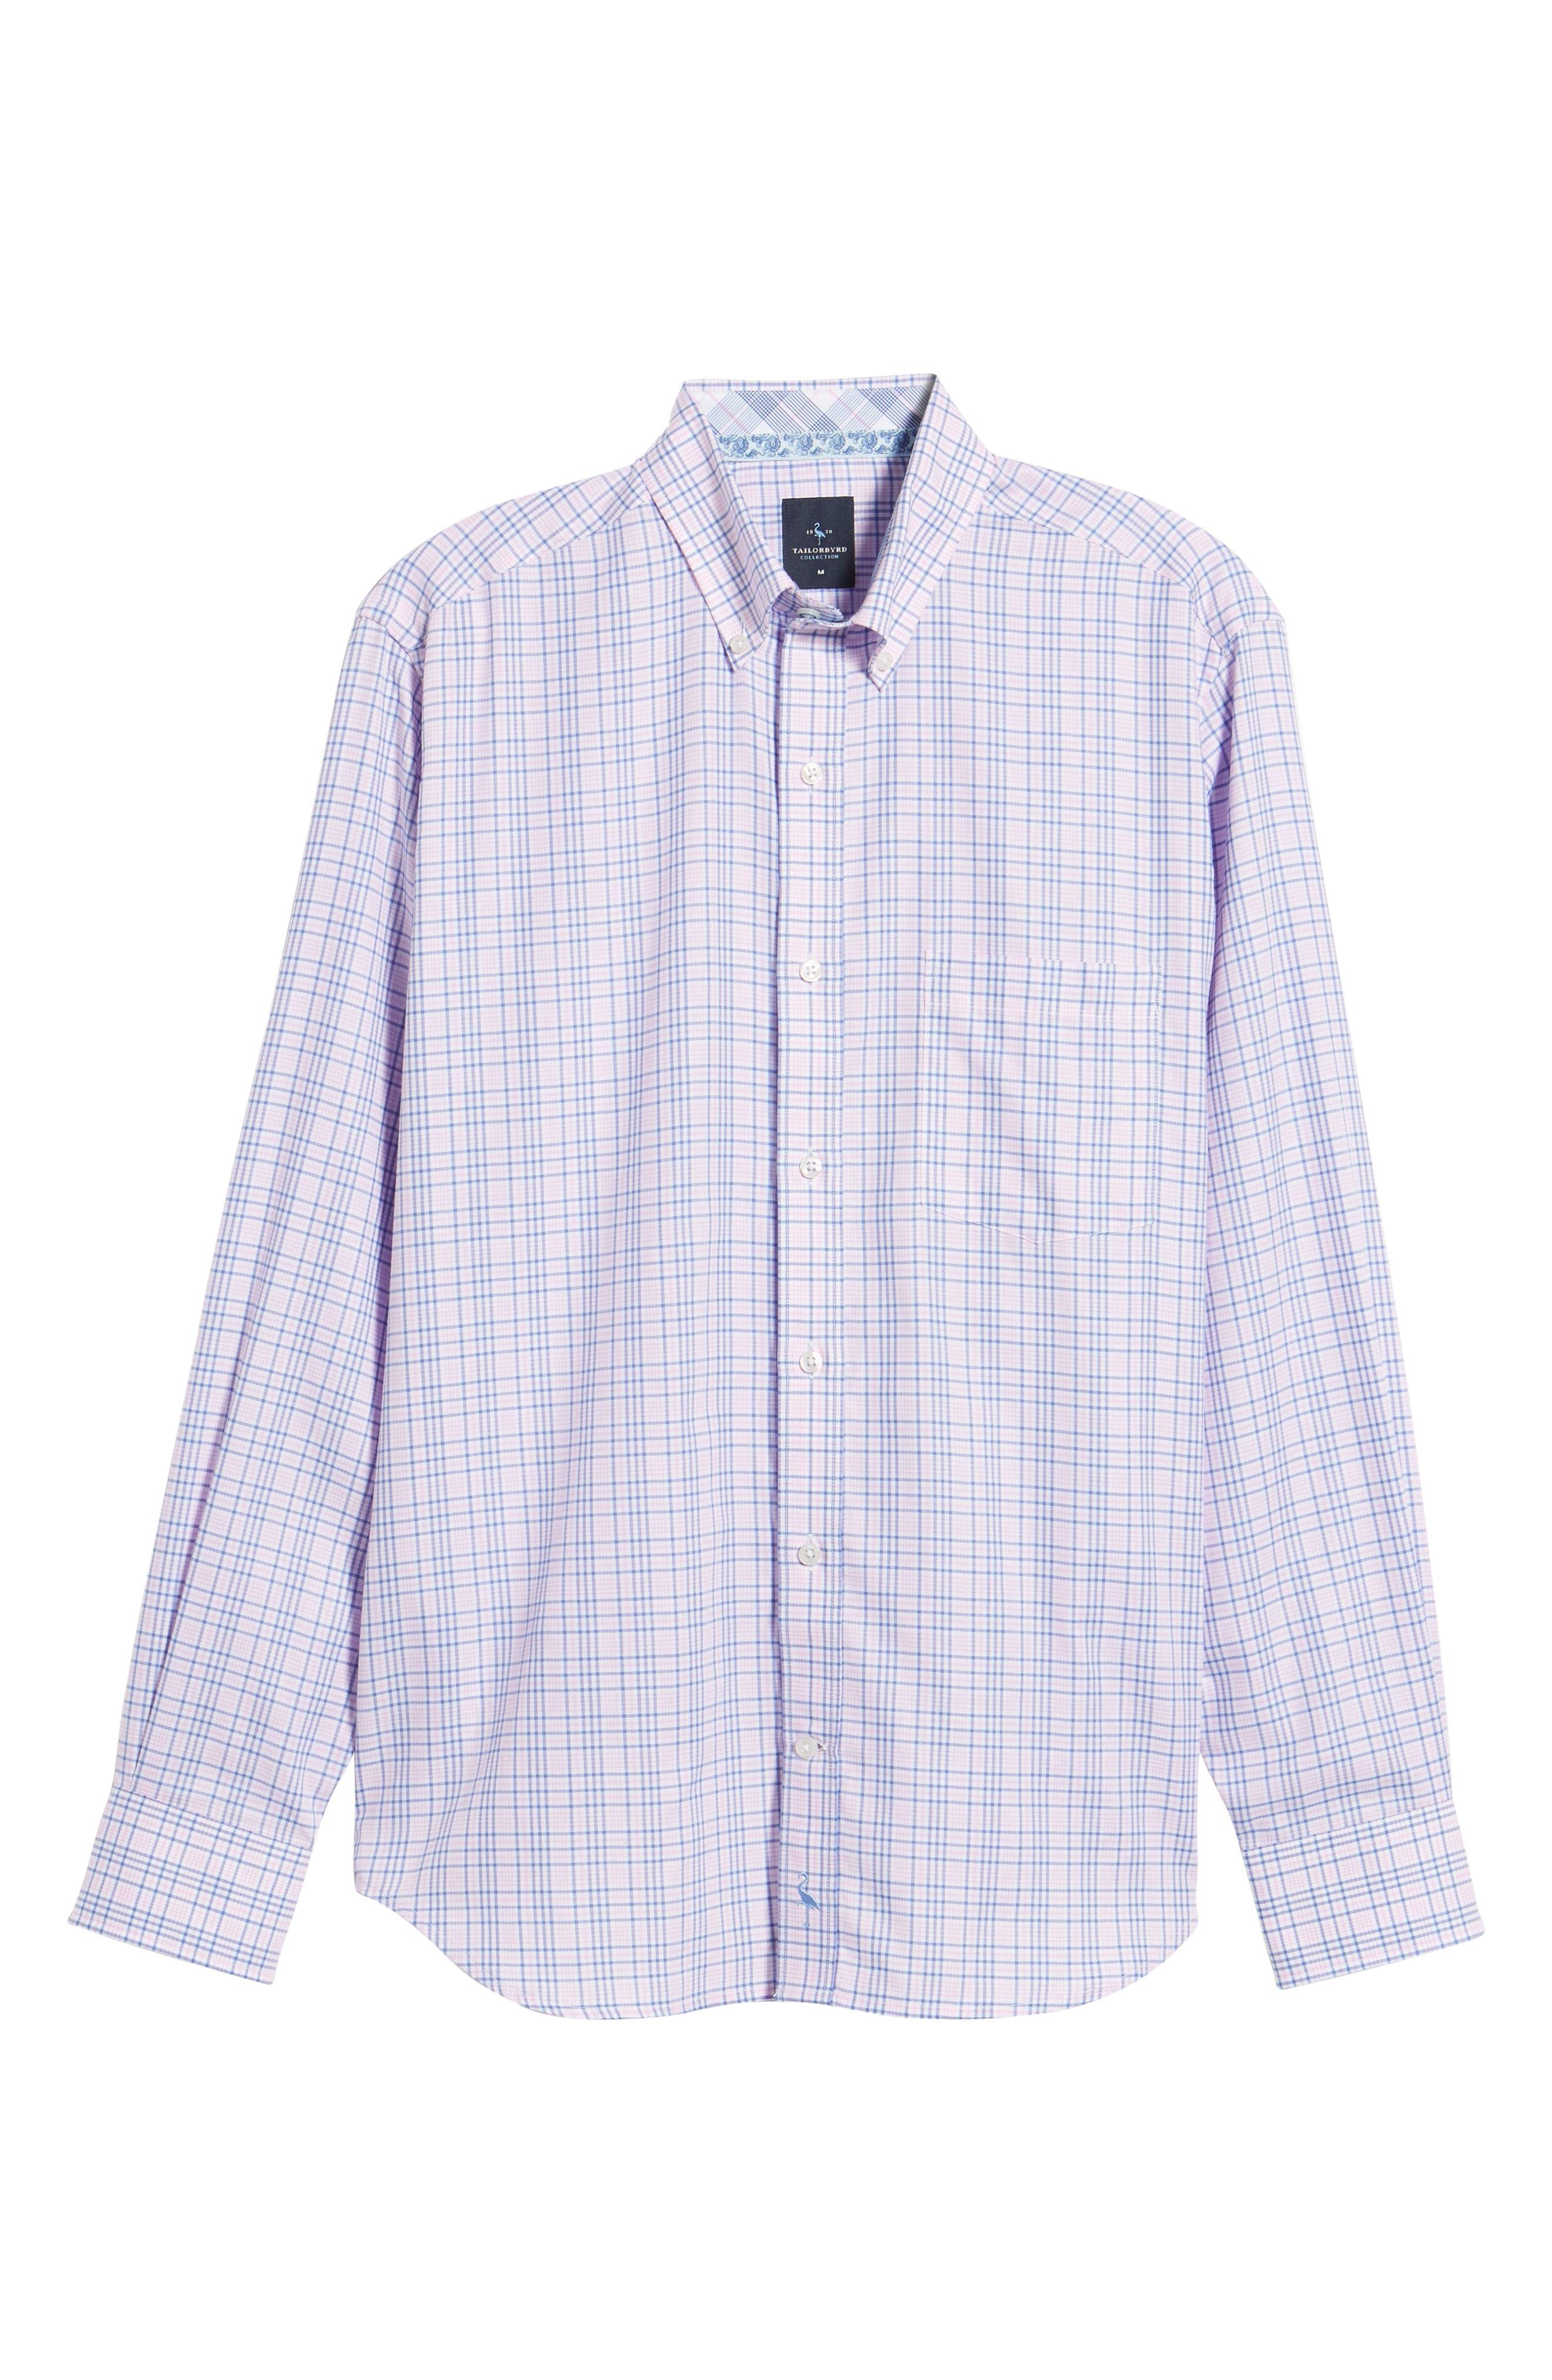 Barry Regular Fit Plaid Sport Shirt,                             Alternate thumbnail 6, color,                             650